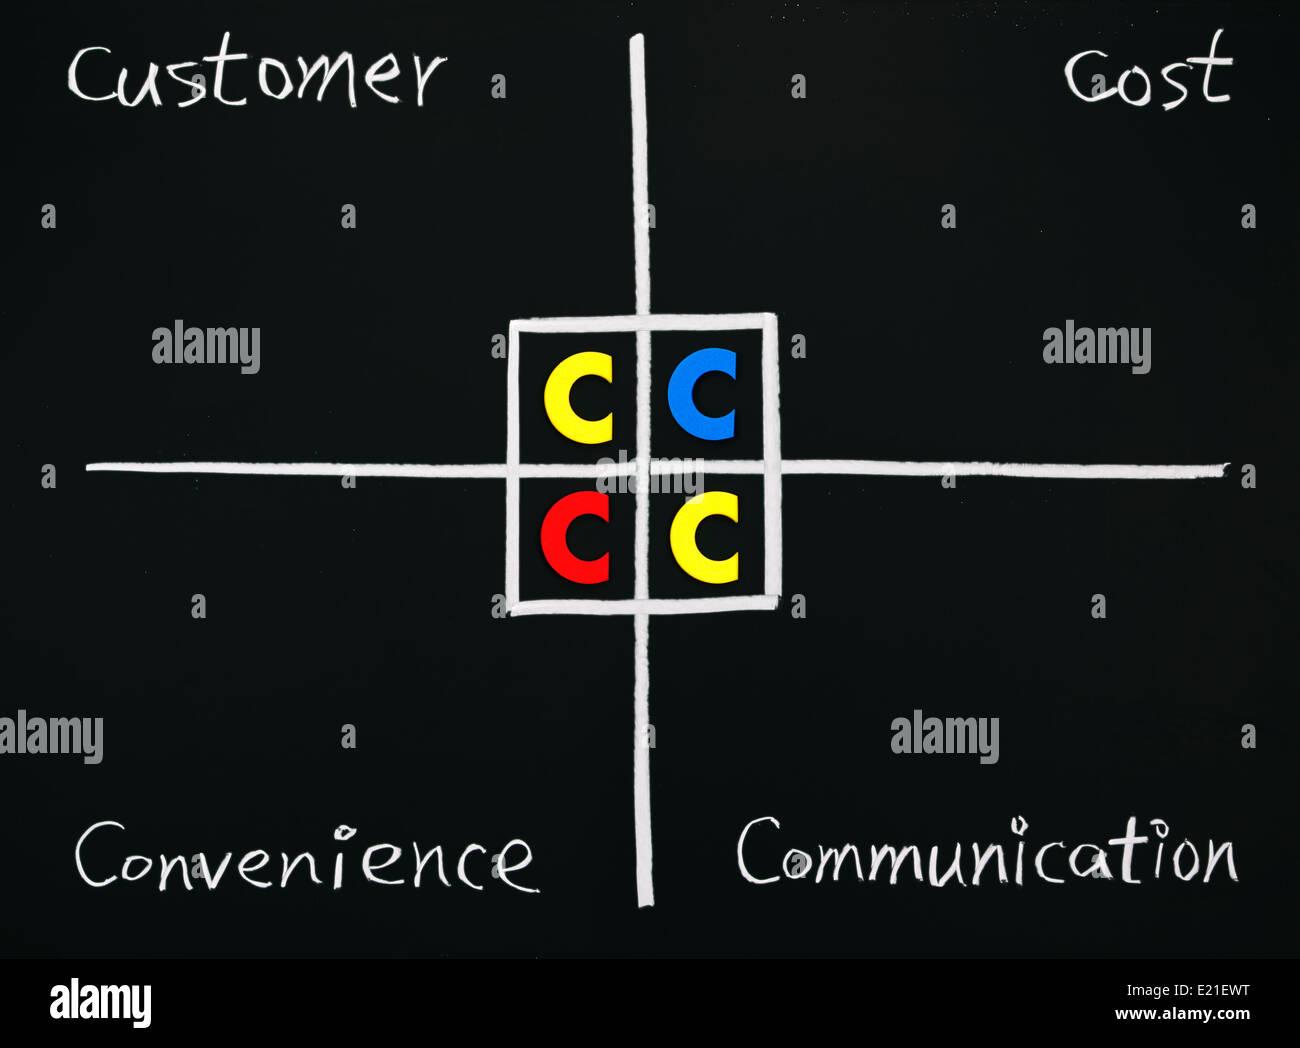 Marketing Theory of 4C - Stock Image